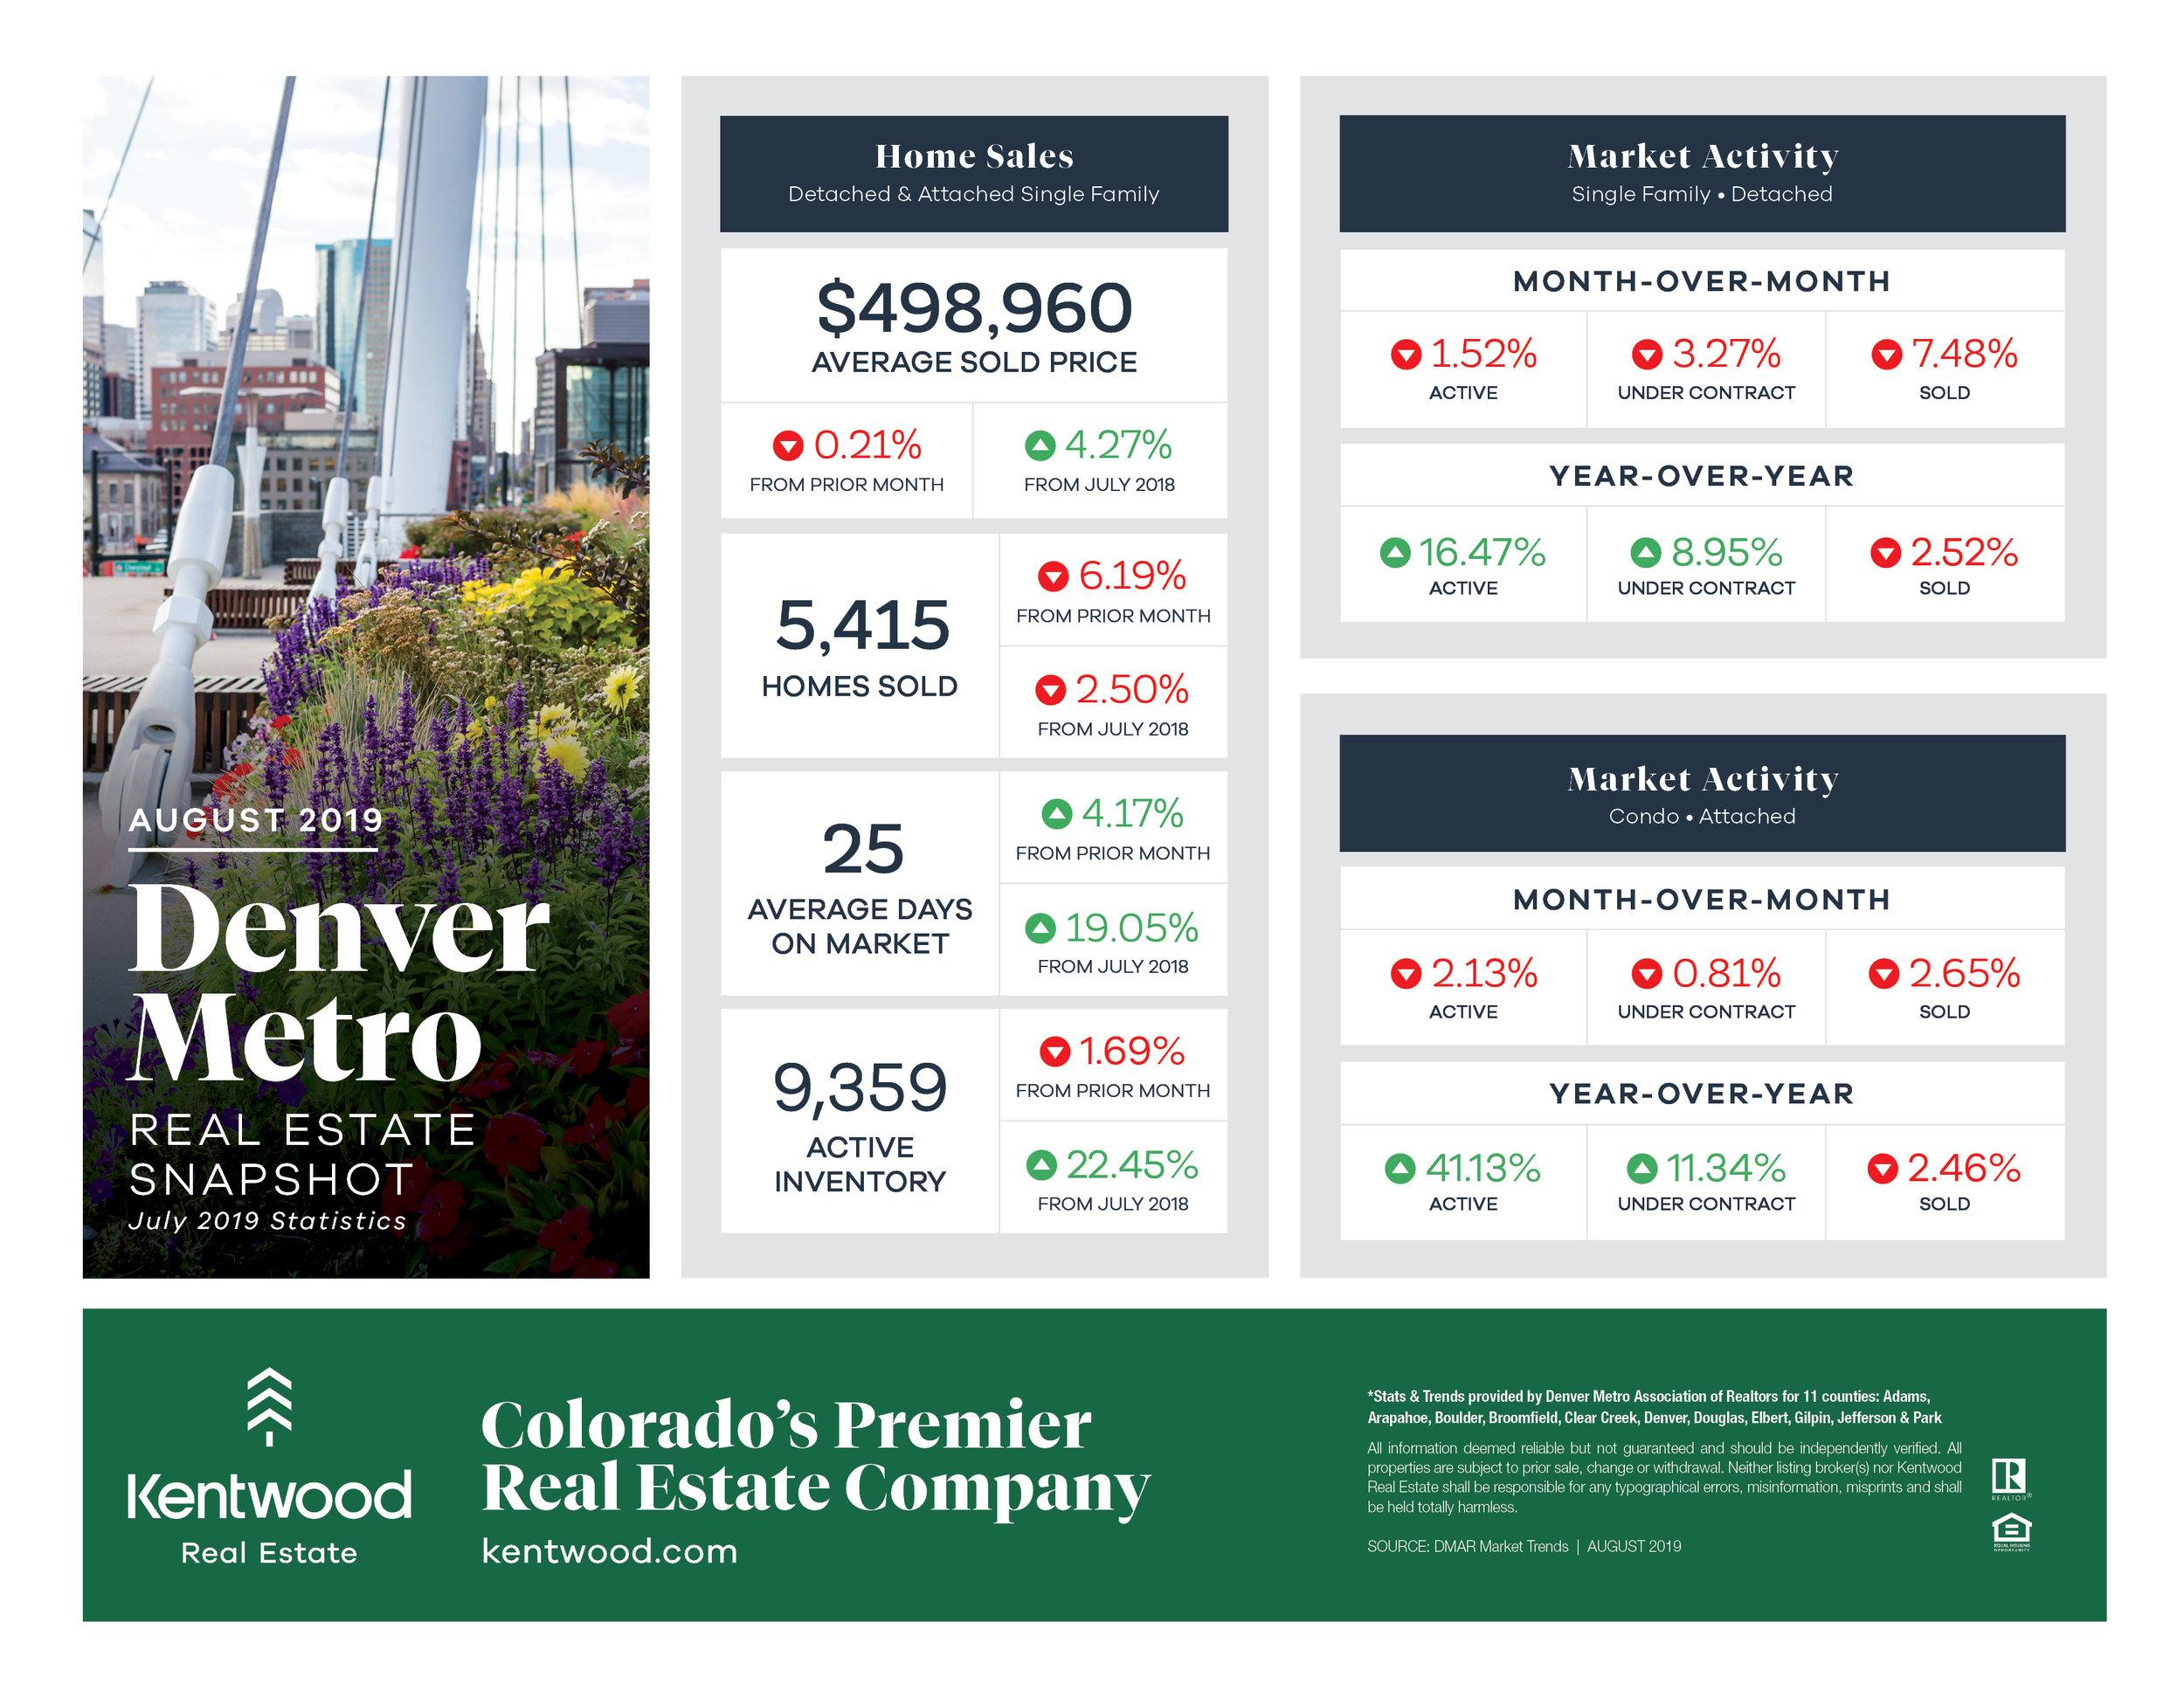 August_Denver_Metro_StatsUpdatedBranding.jpg